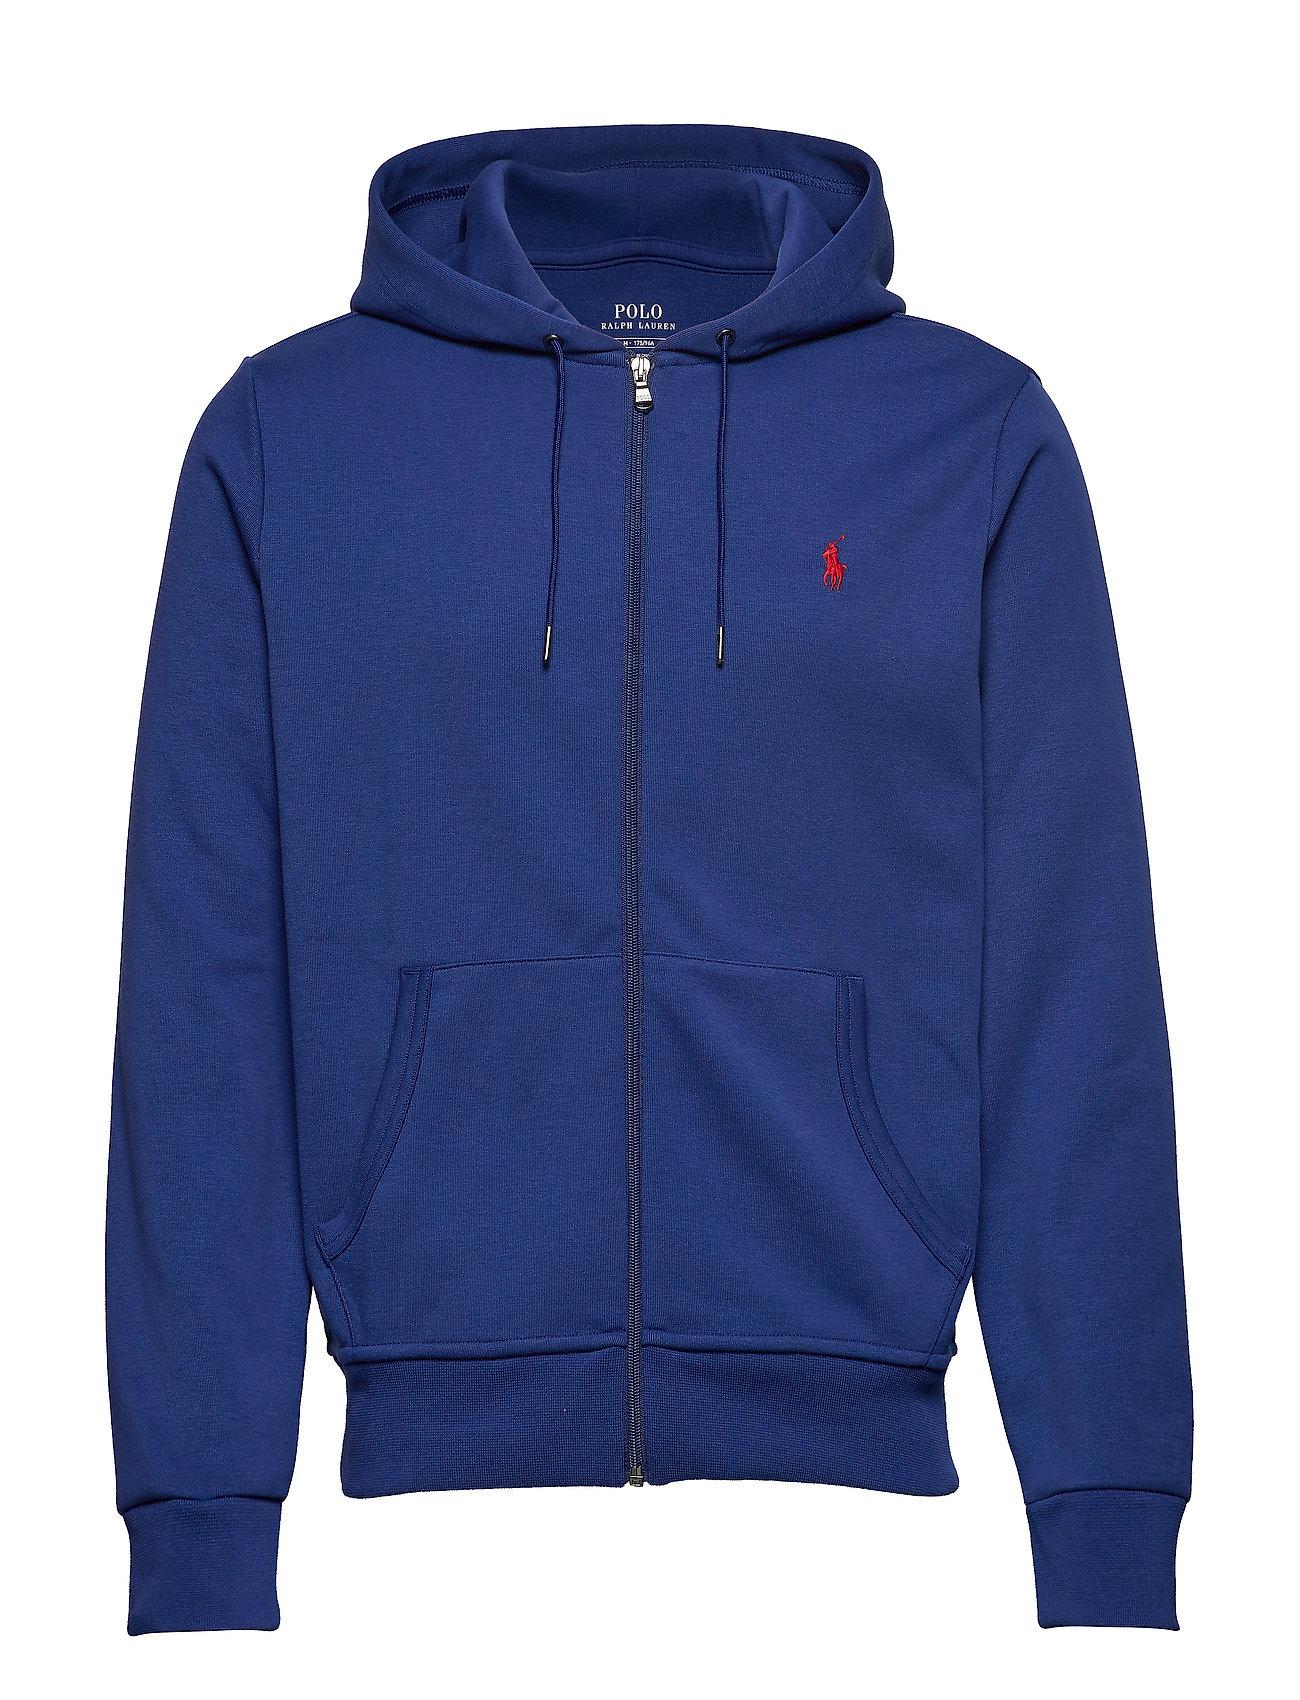 Polo Ralph Lauren Double-Knit Full-Zip Hoodie - SPORTING ROYAL